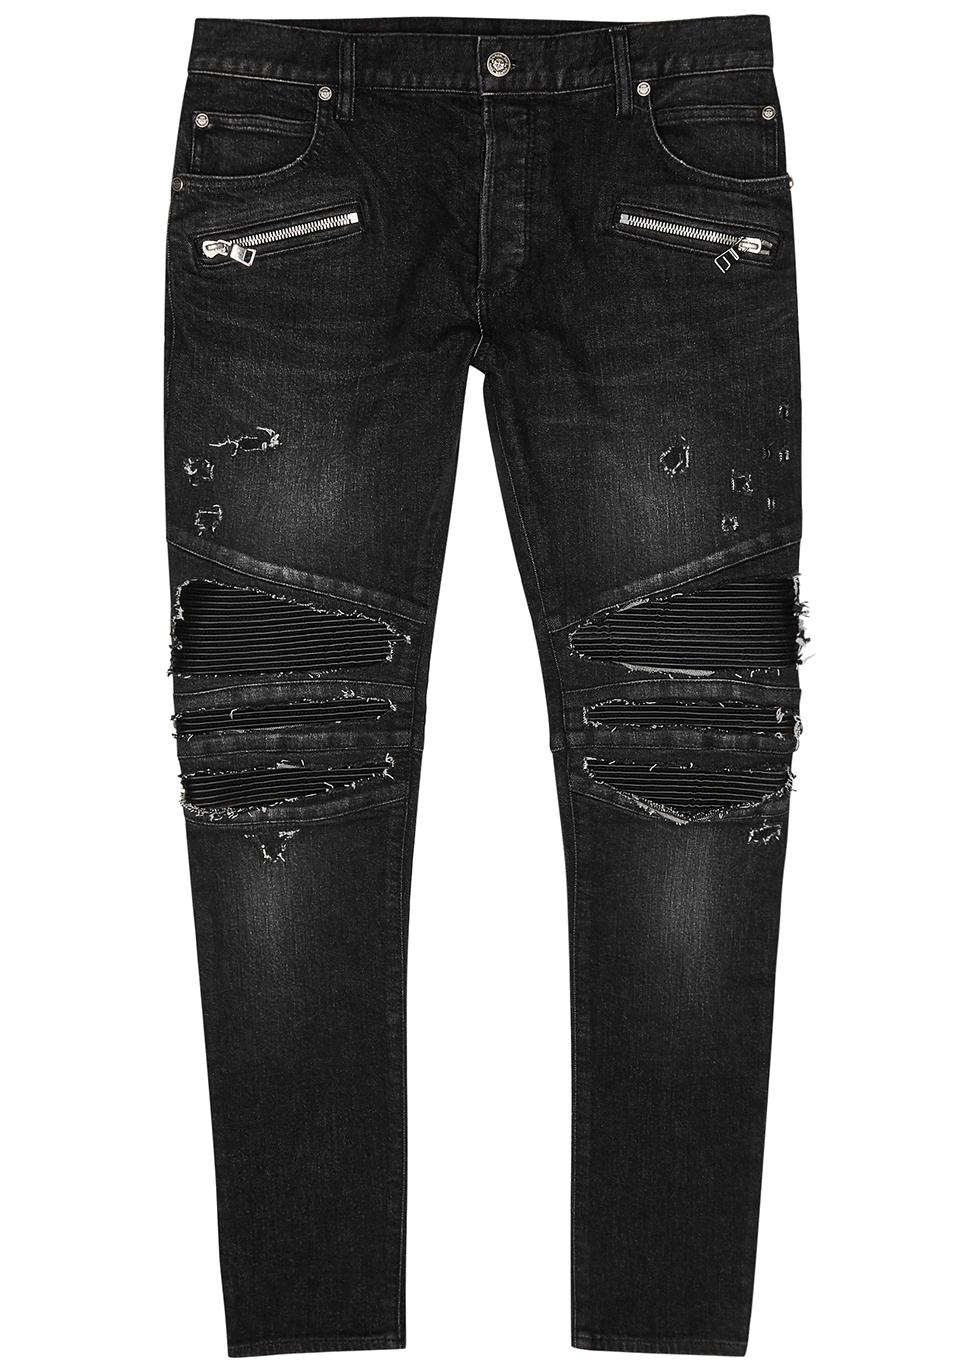 Dark grey distressed skinny jeans